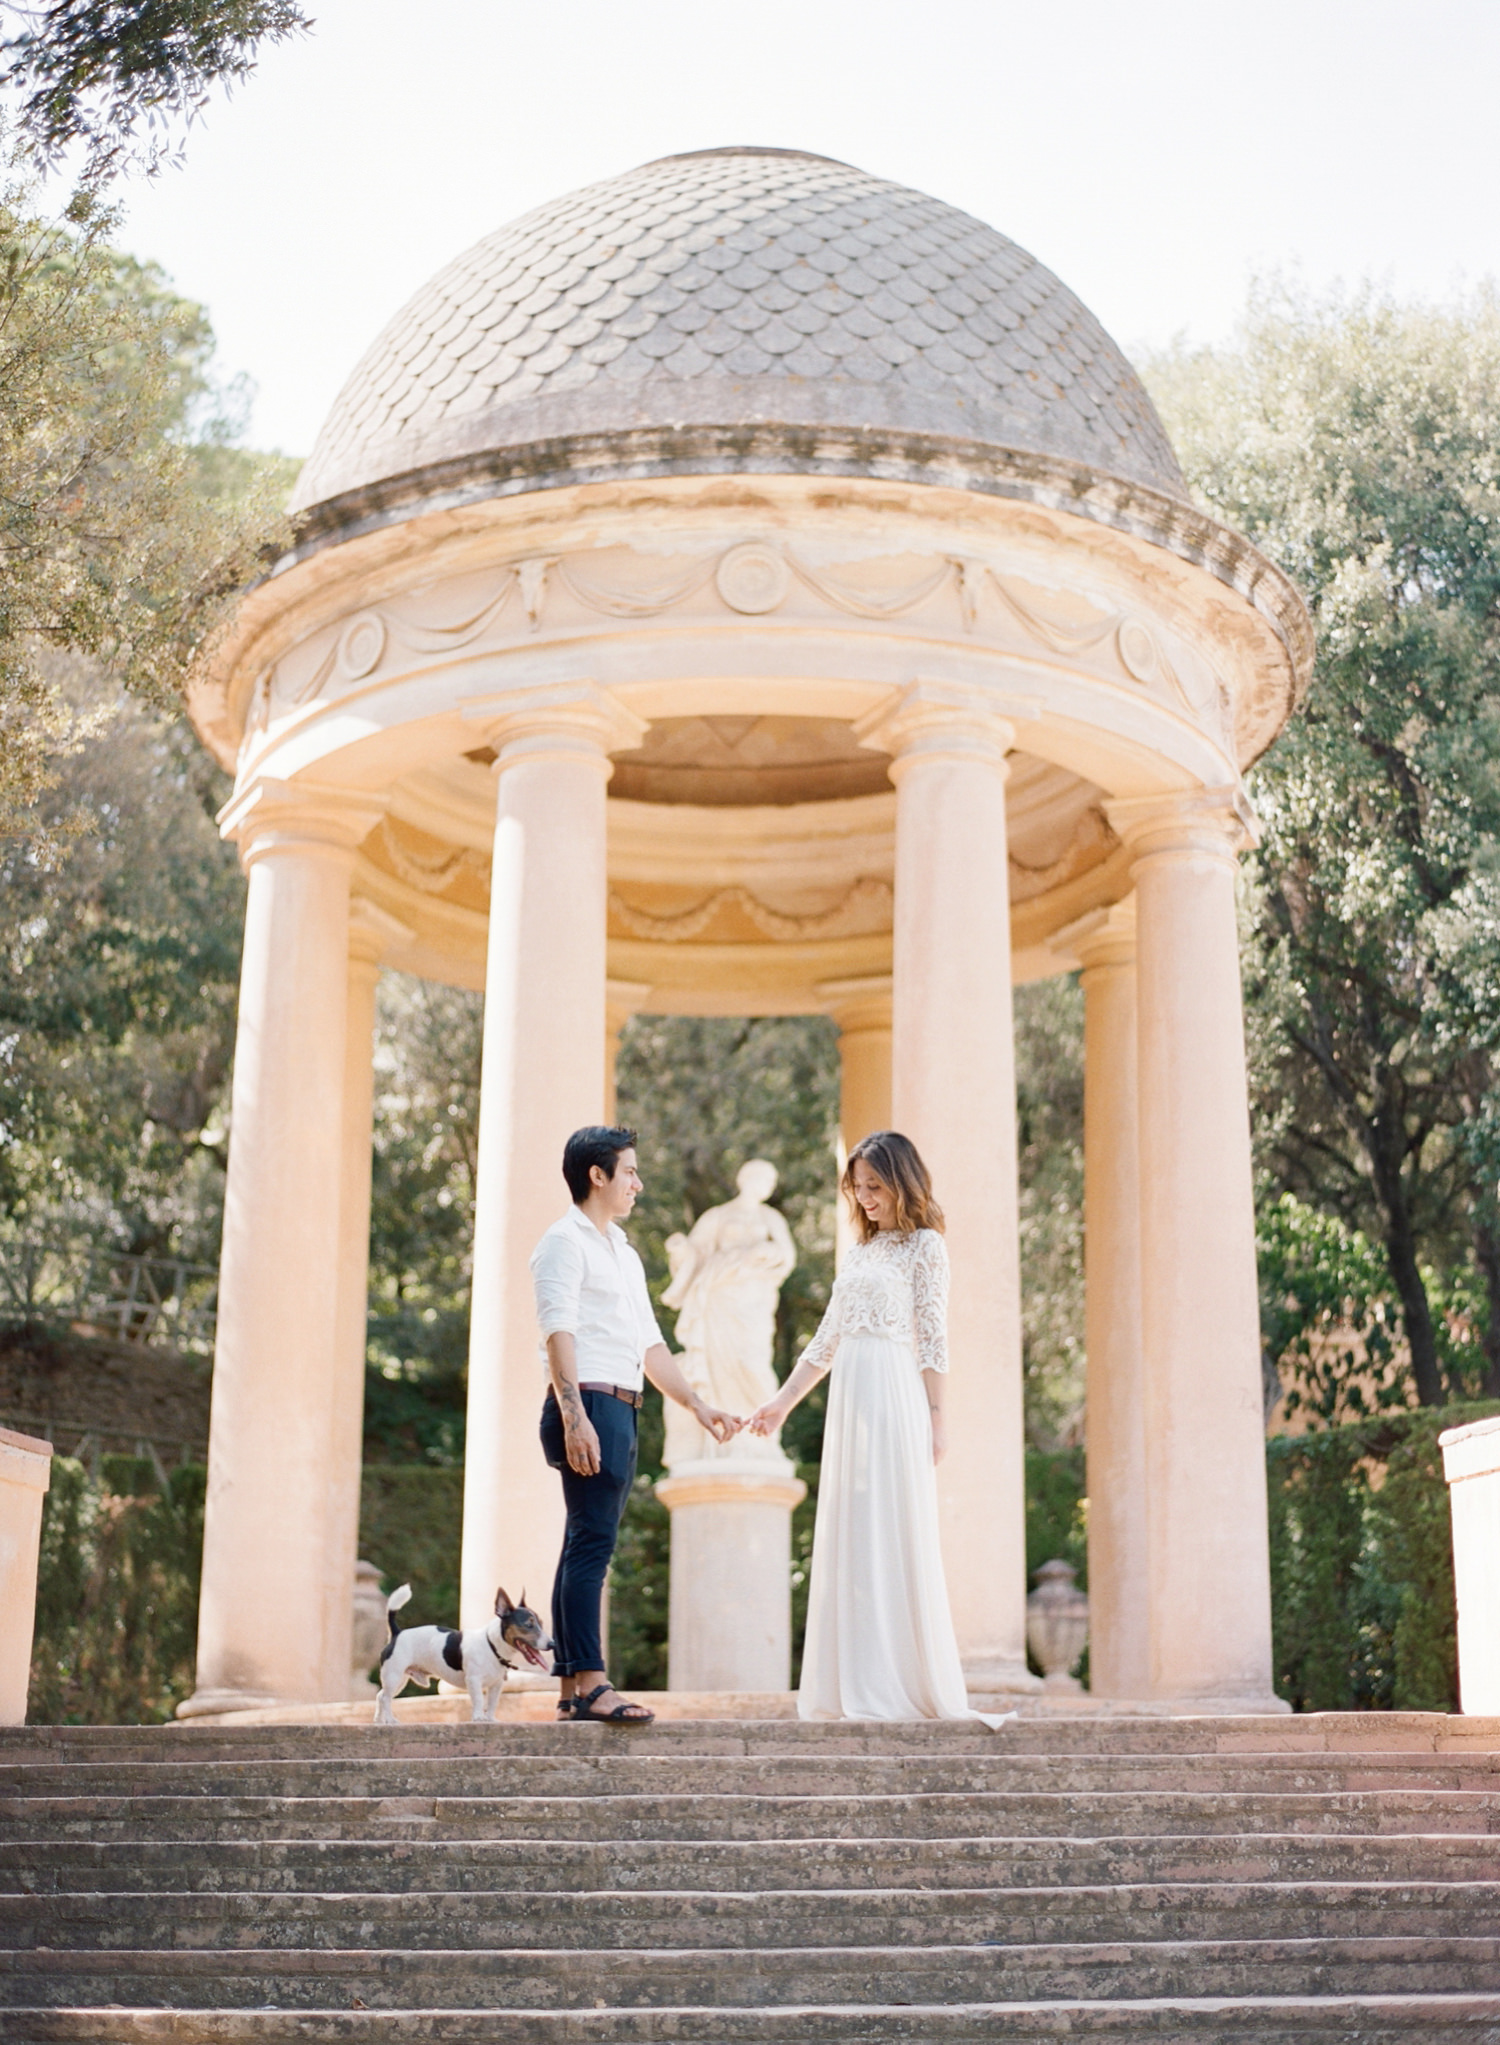 destination wedding photographer Barcelona, Spain